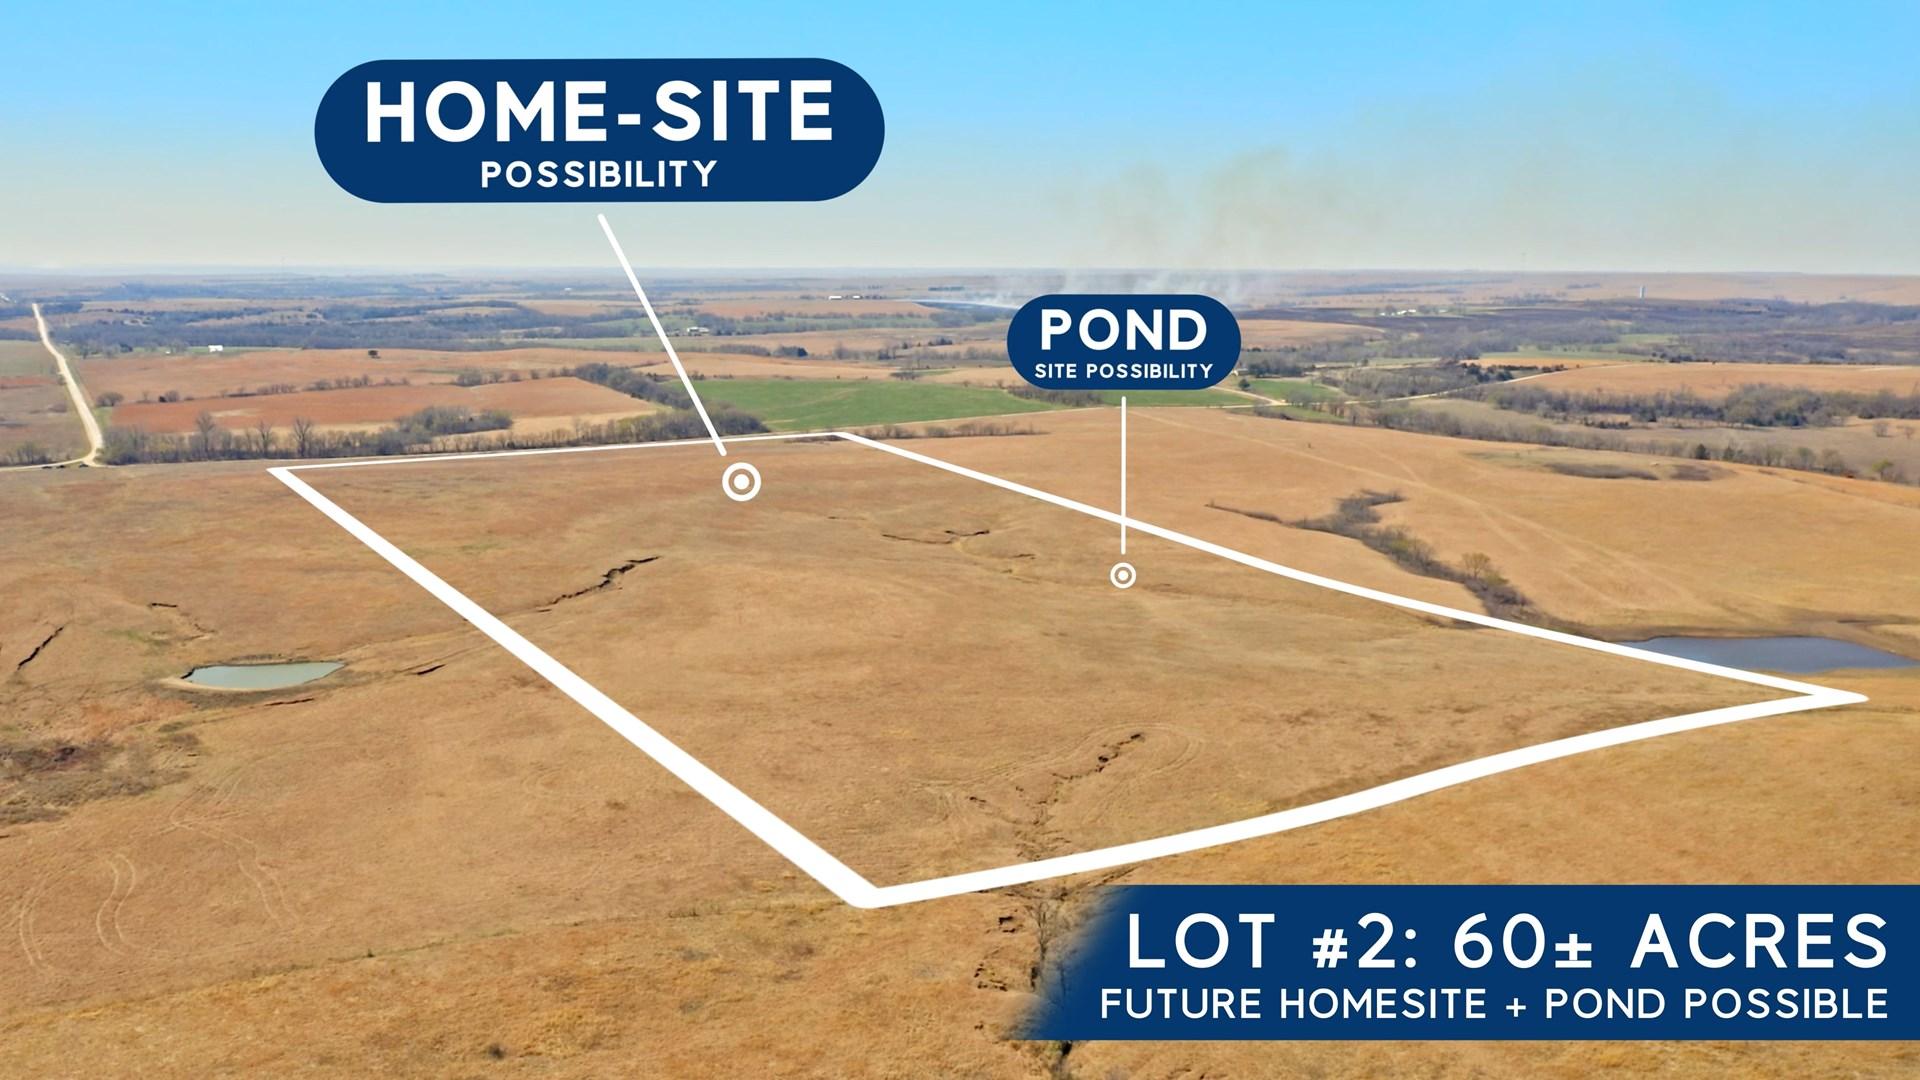 Kansas Ranch Land For Sale, Home Site, Scenic Flint Hills